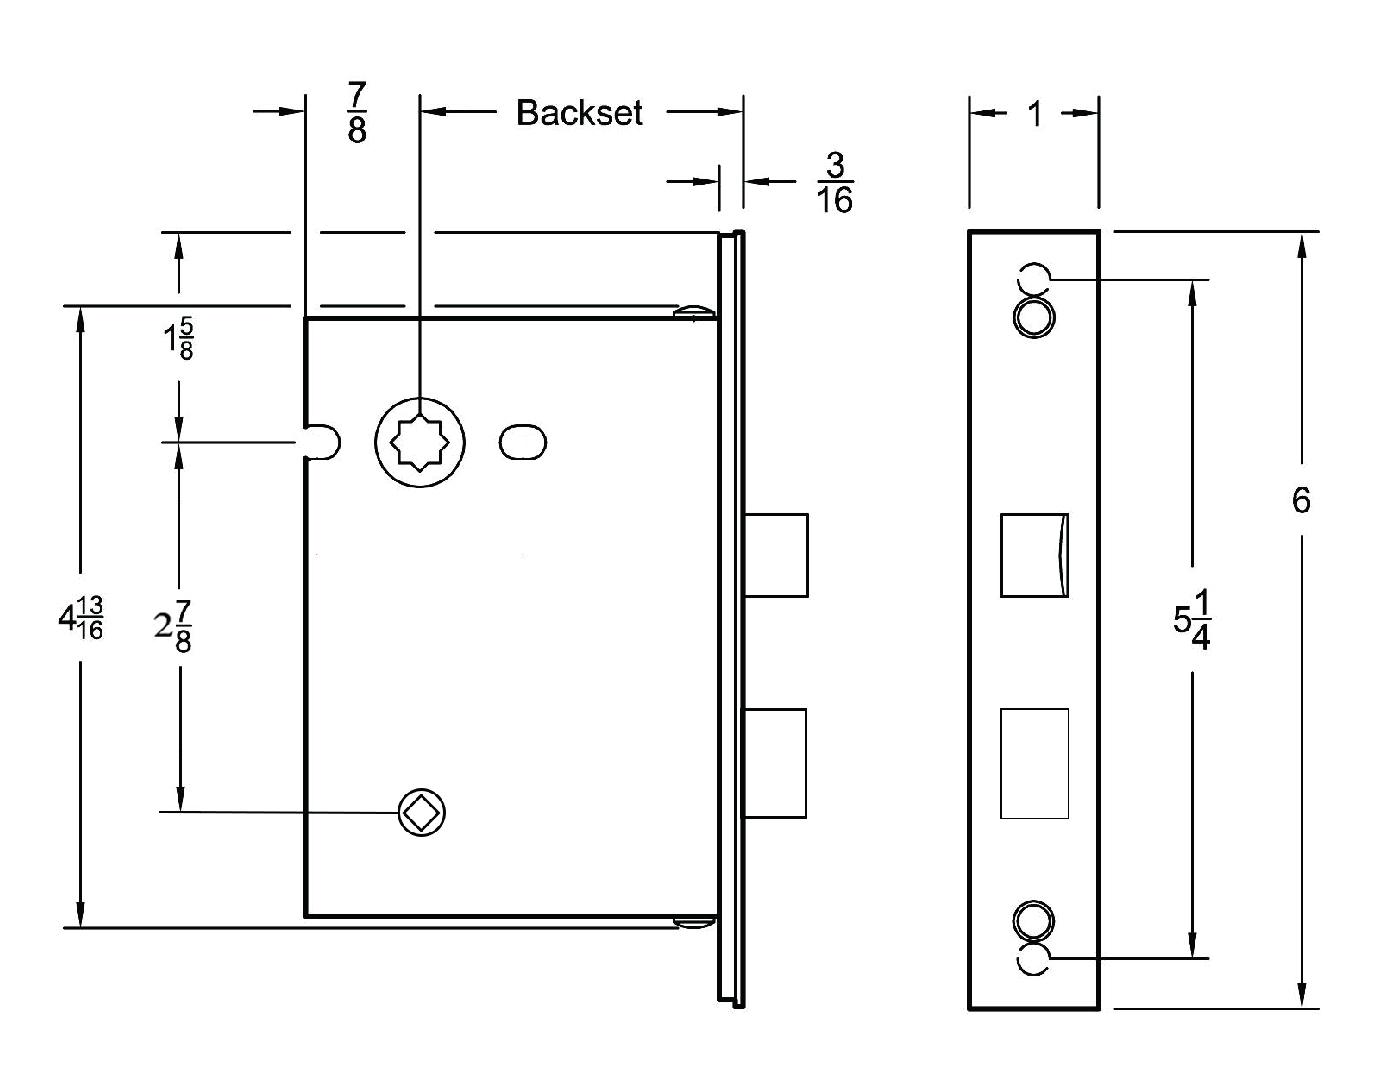 hight resolution of h theophile diagram ha9839 jpg